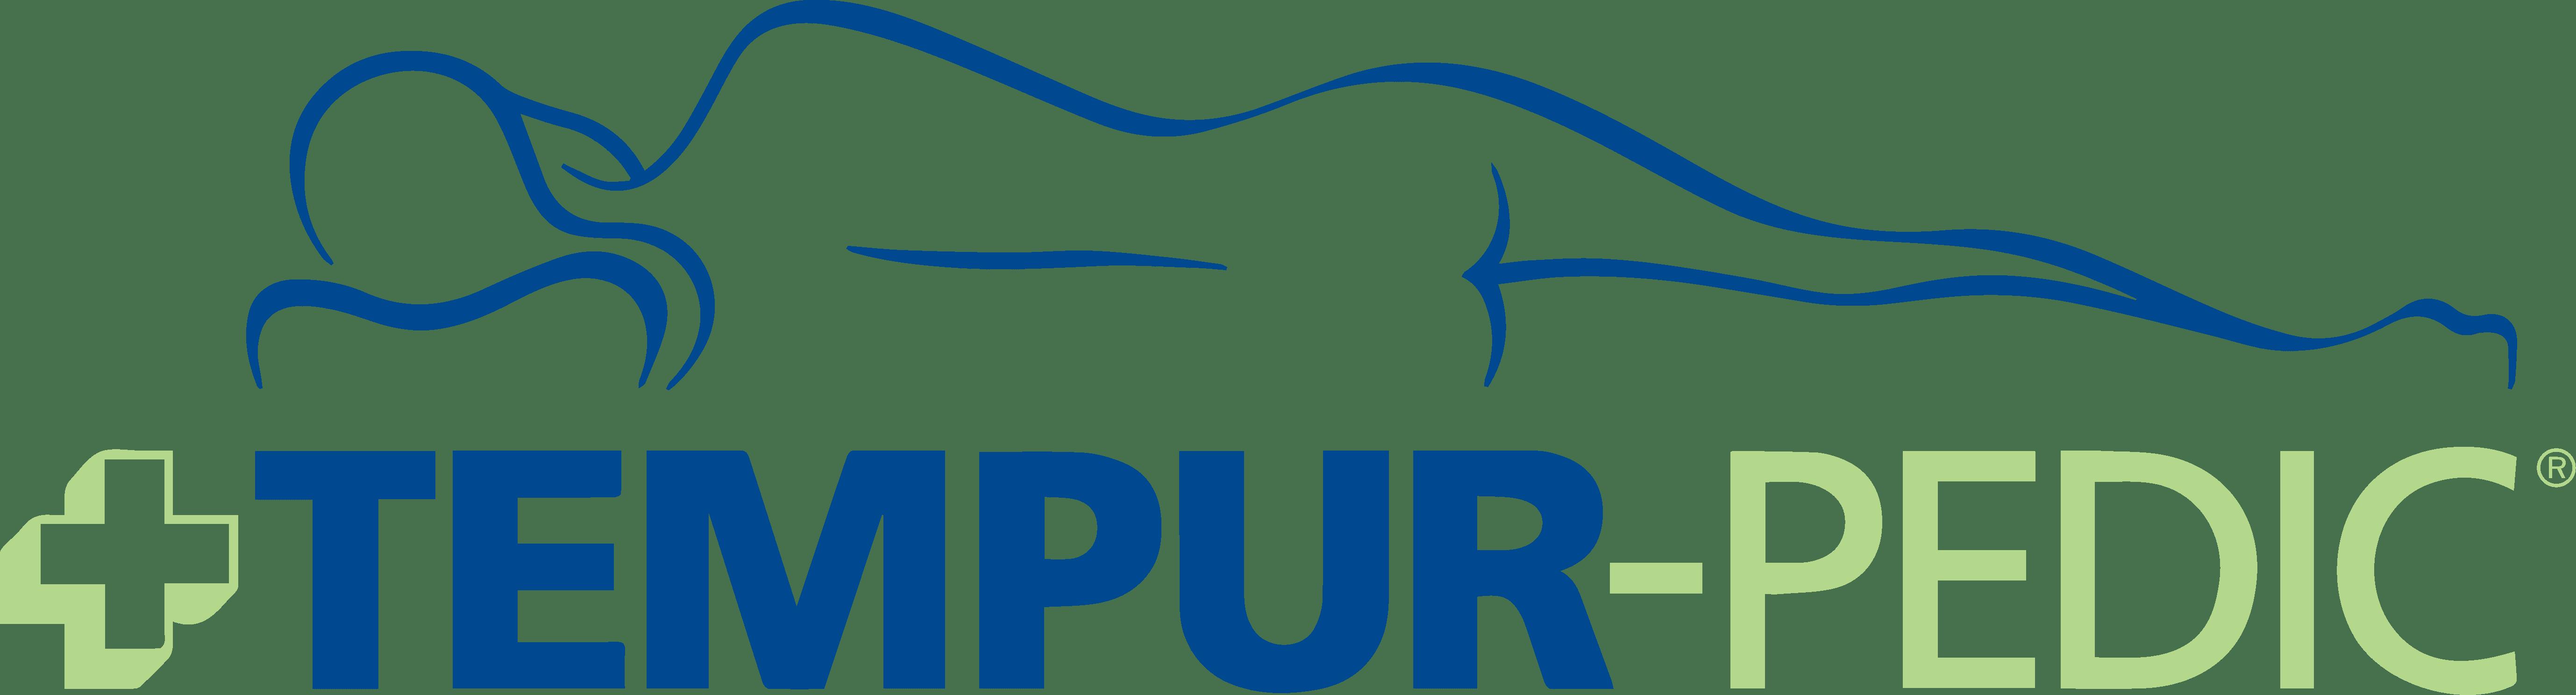 Tempur Pedic Flex Supreme Breeze Mattress Customer Reviews 2019